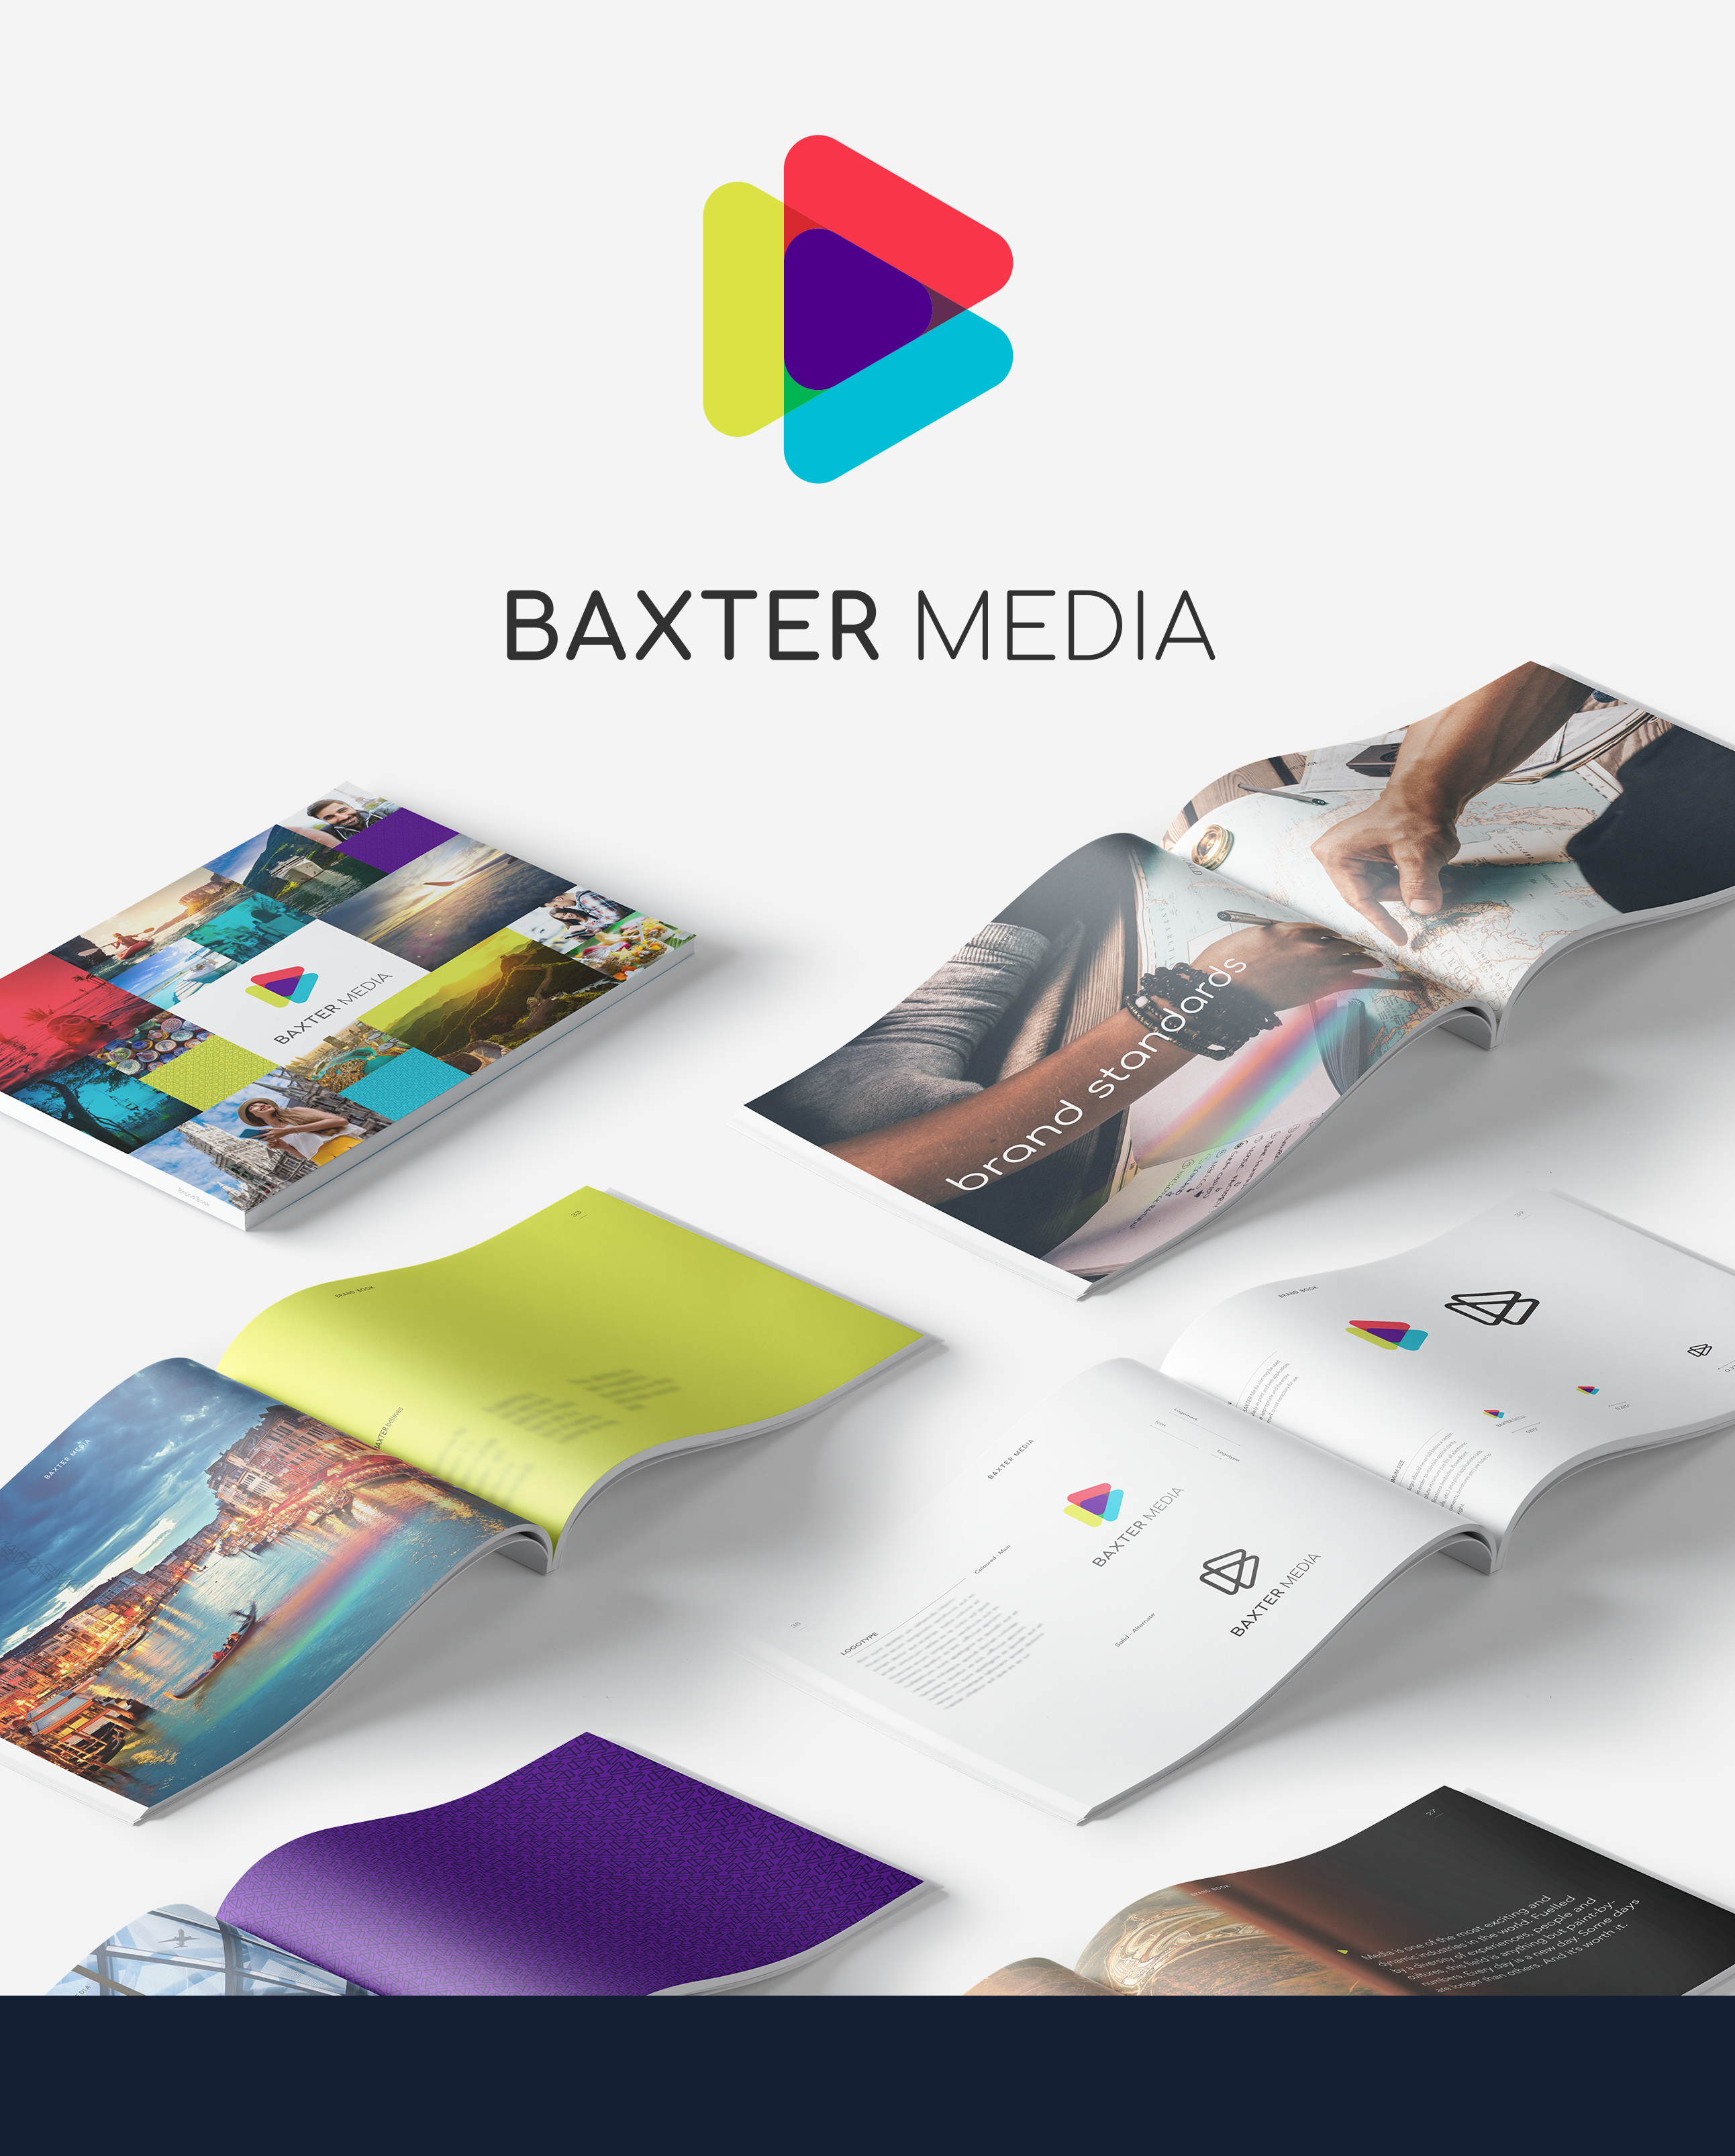 Baxter Media Brand Strategy